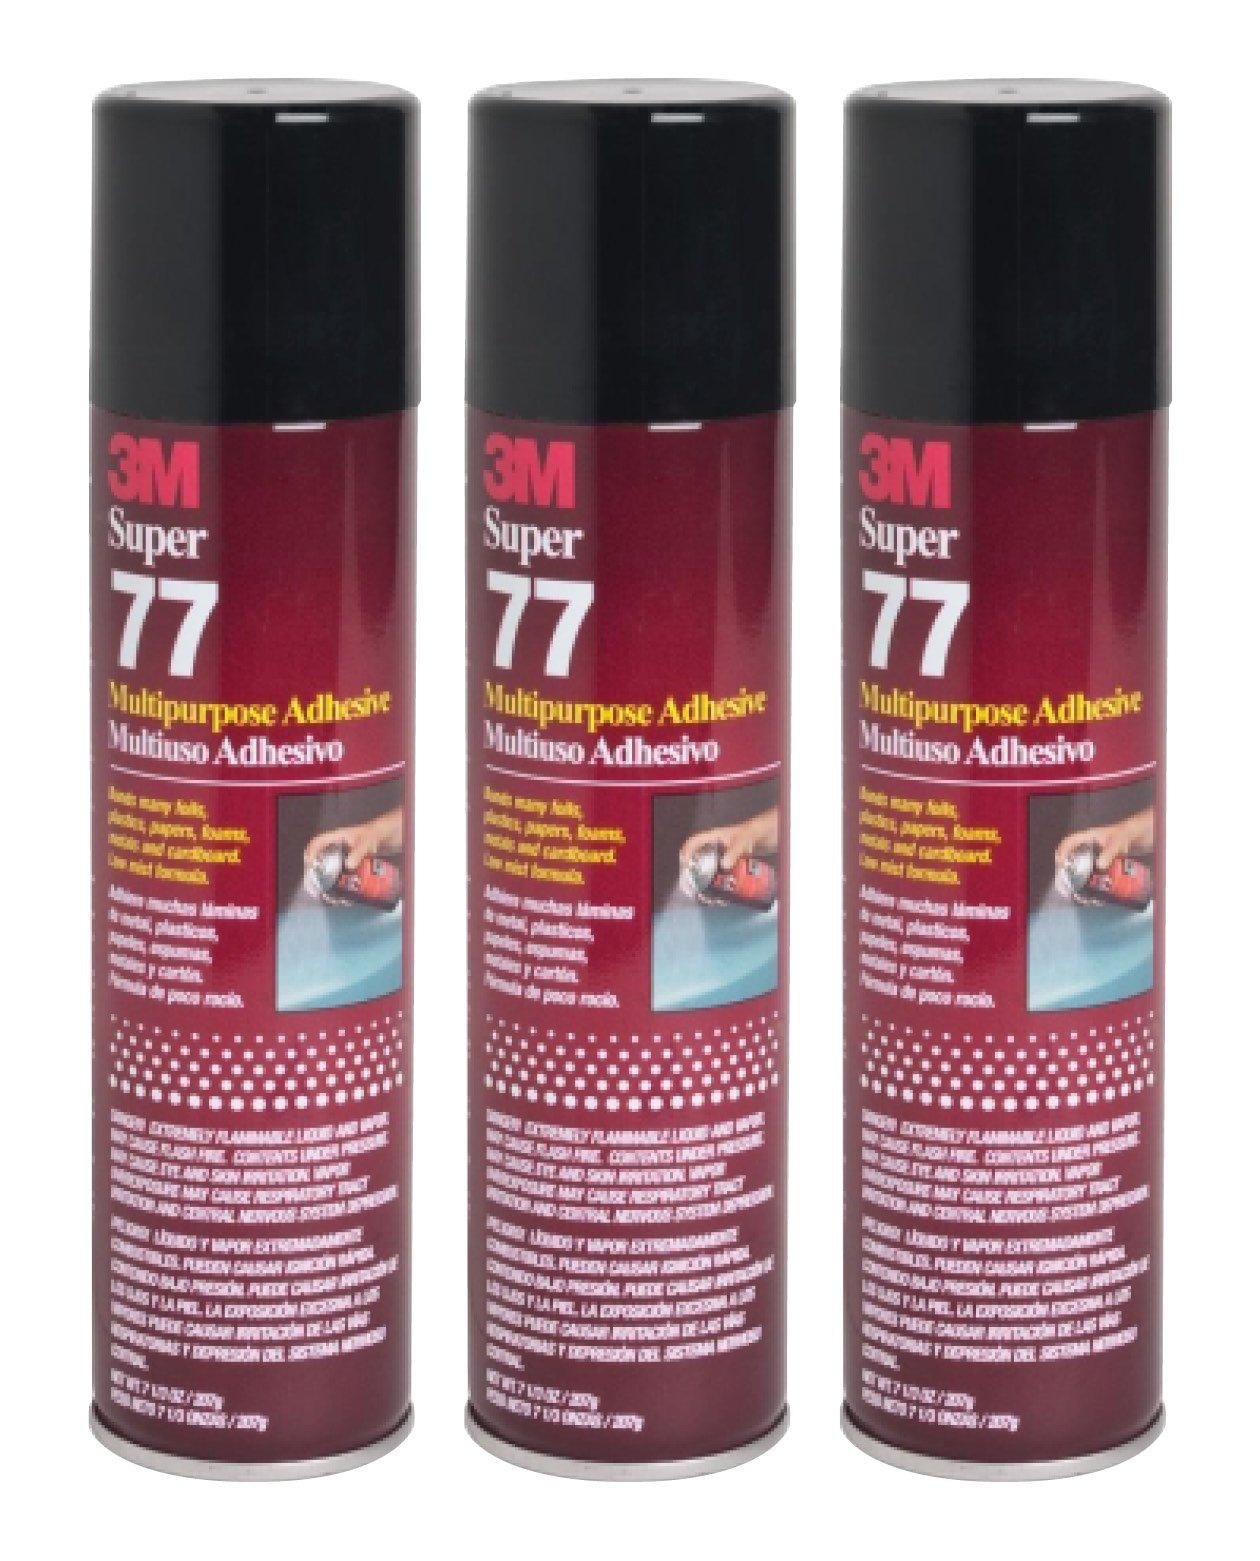 QTY3 3M SUPER 77 7.3 OZ LARGE SPRAY GLUE CAN MULTIPURPOSE ADHESIVE